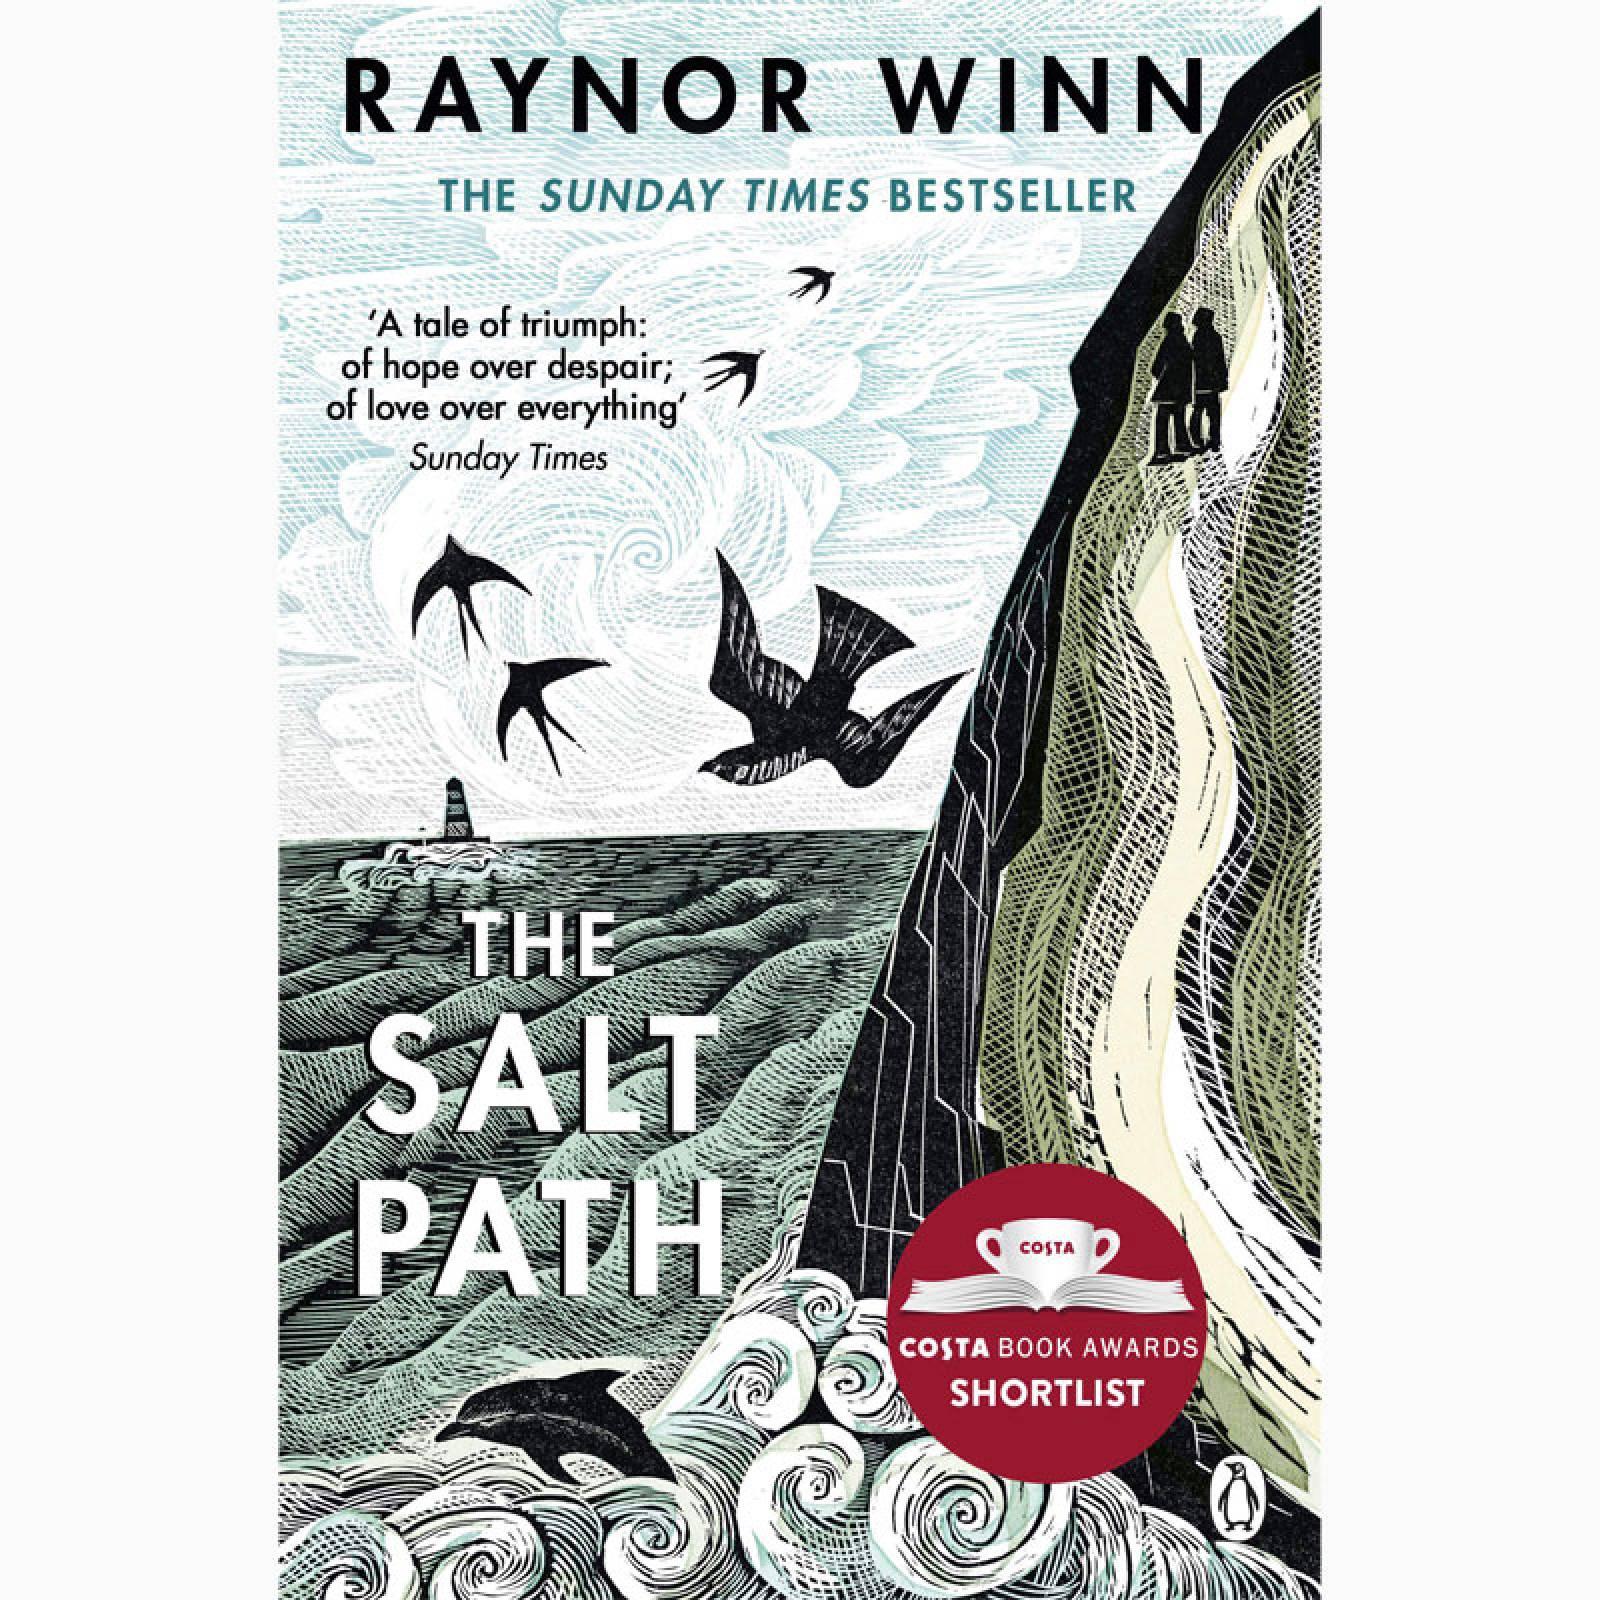 The Salt Path - Paperback Book